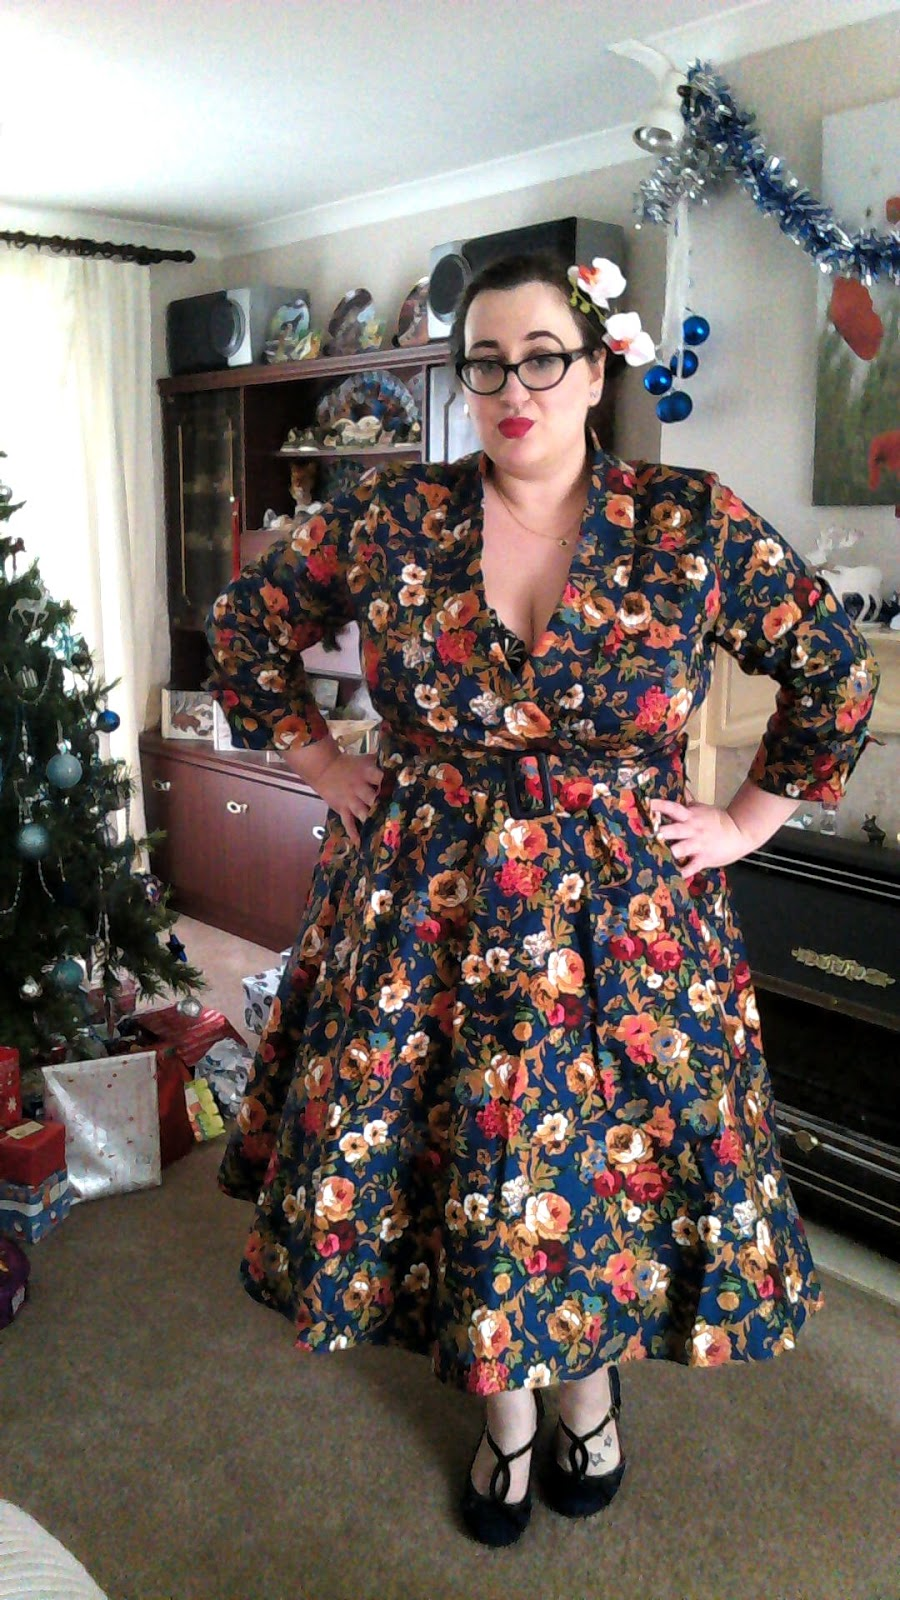 12 Days Of Christmas Dresses #3 - Does My Blog Make Me ...